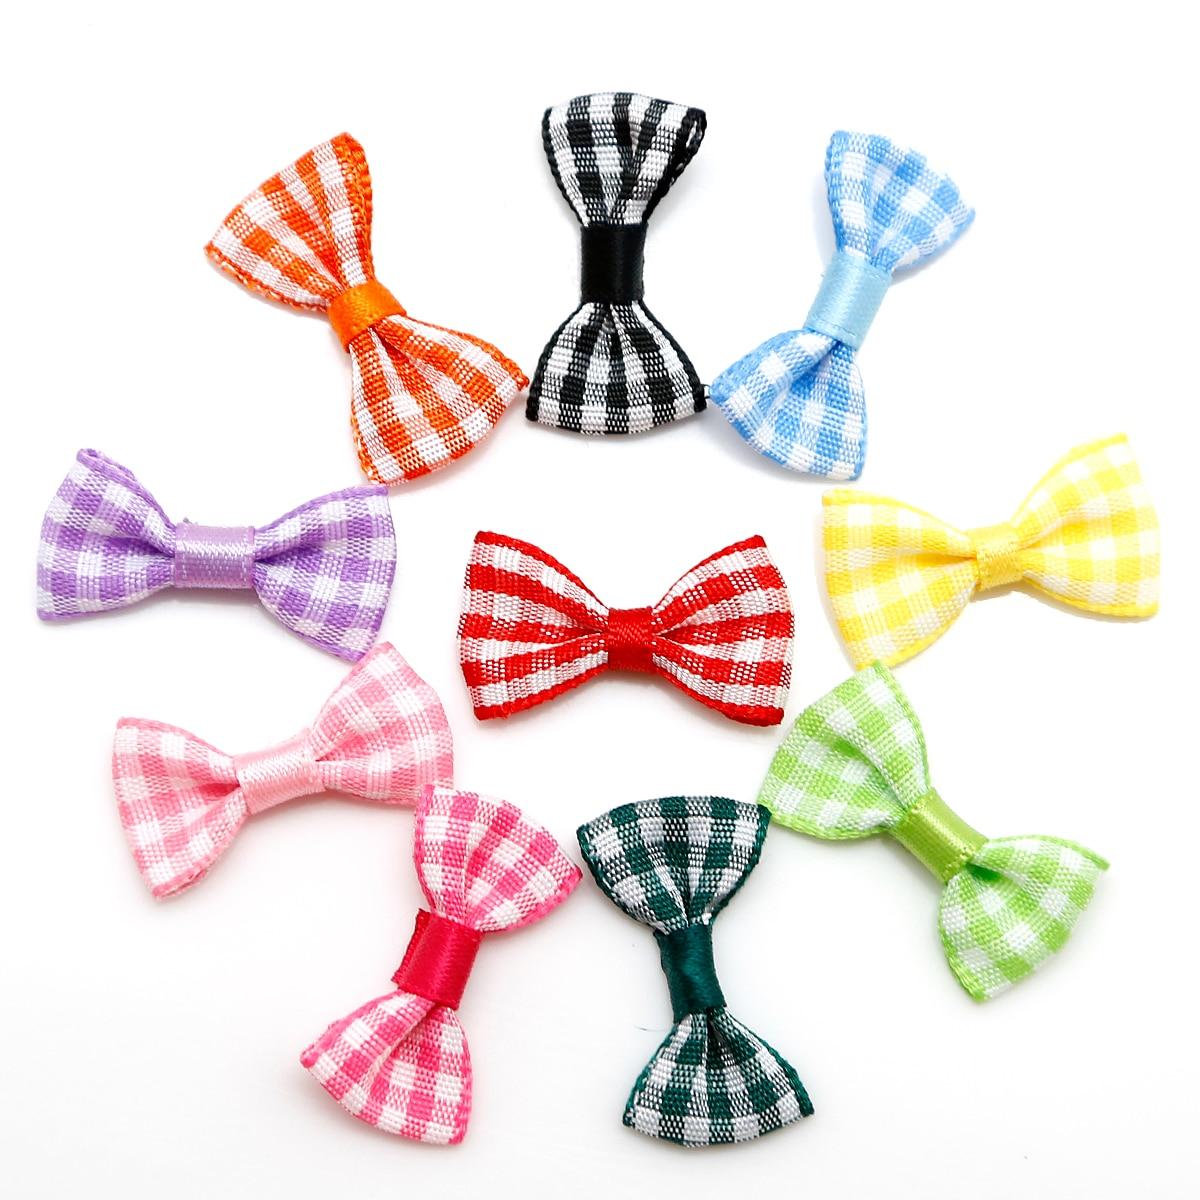 25/50pcs 3x1.5cm Multi Color Stripe Ribbon Bow Grosgrain Mini Ribbon Bows Girl Hair Decoration Wedding Craft Sewing Decoration